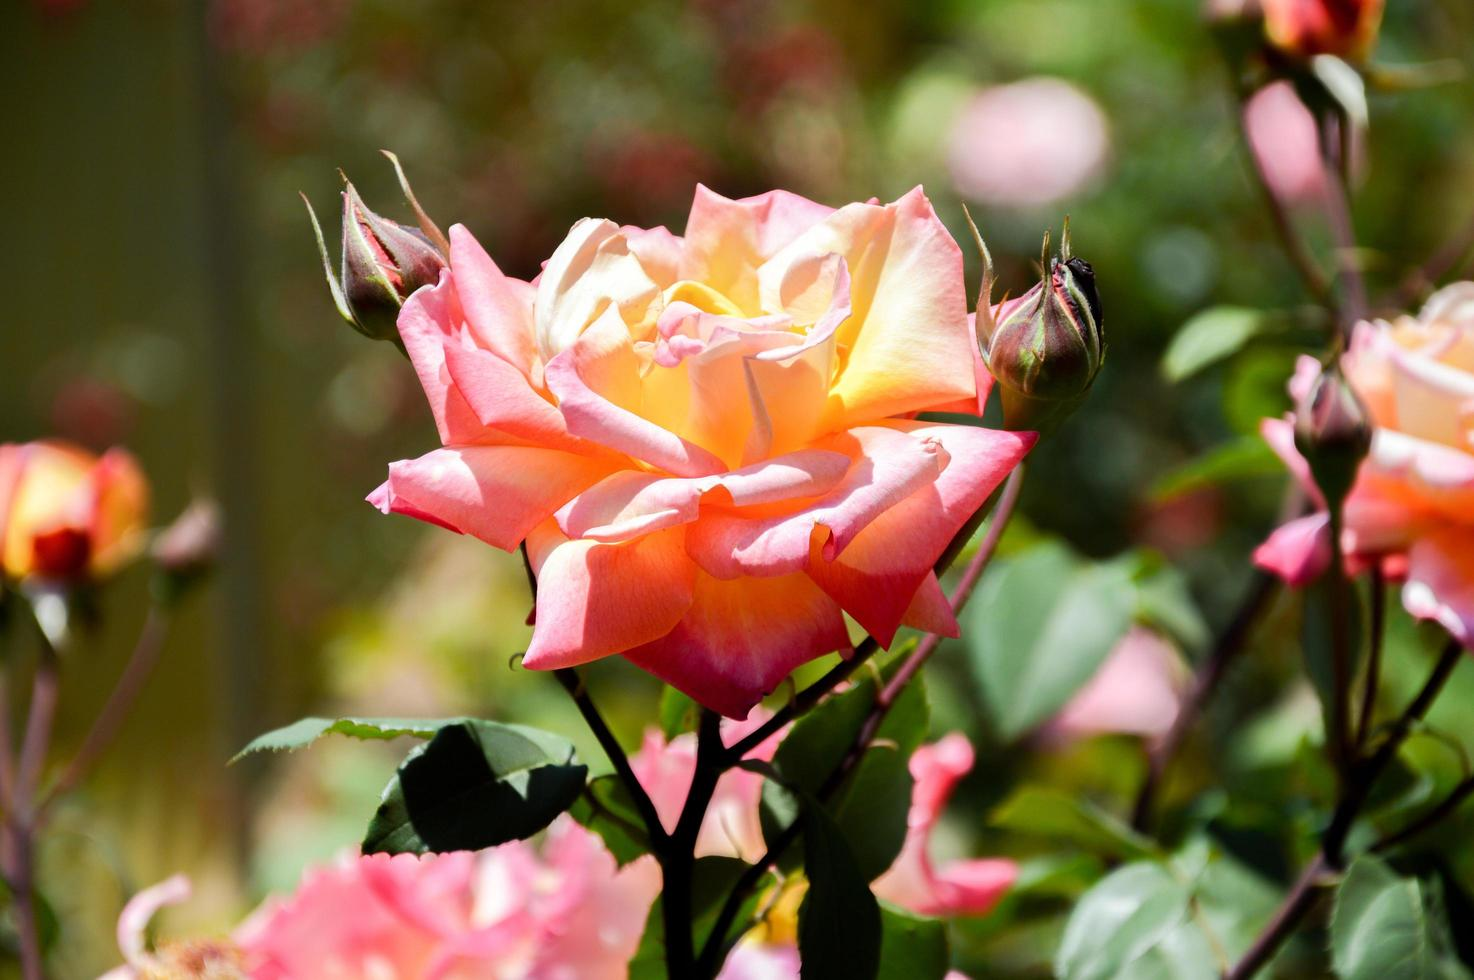 rosa ros i solljus foto